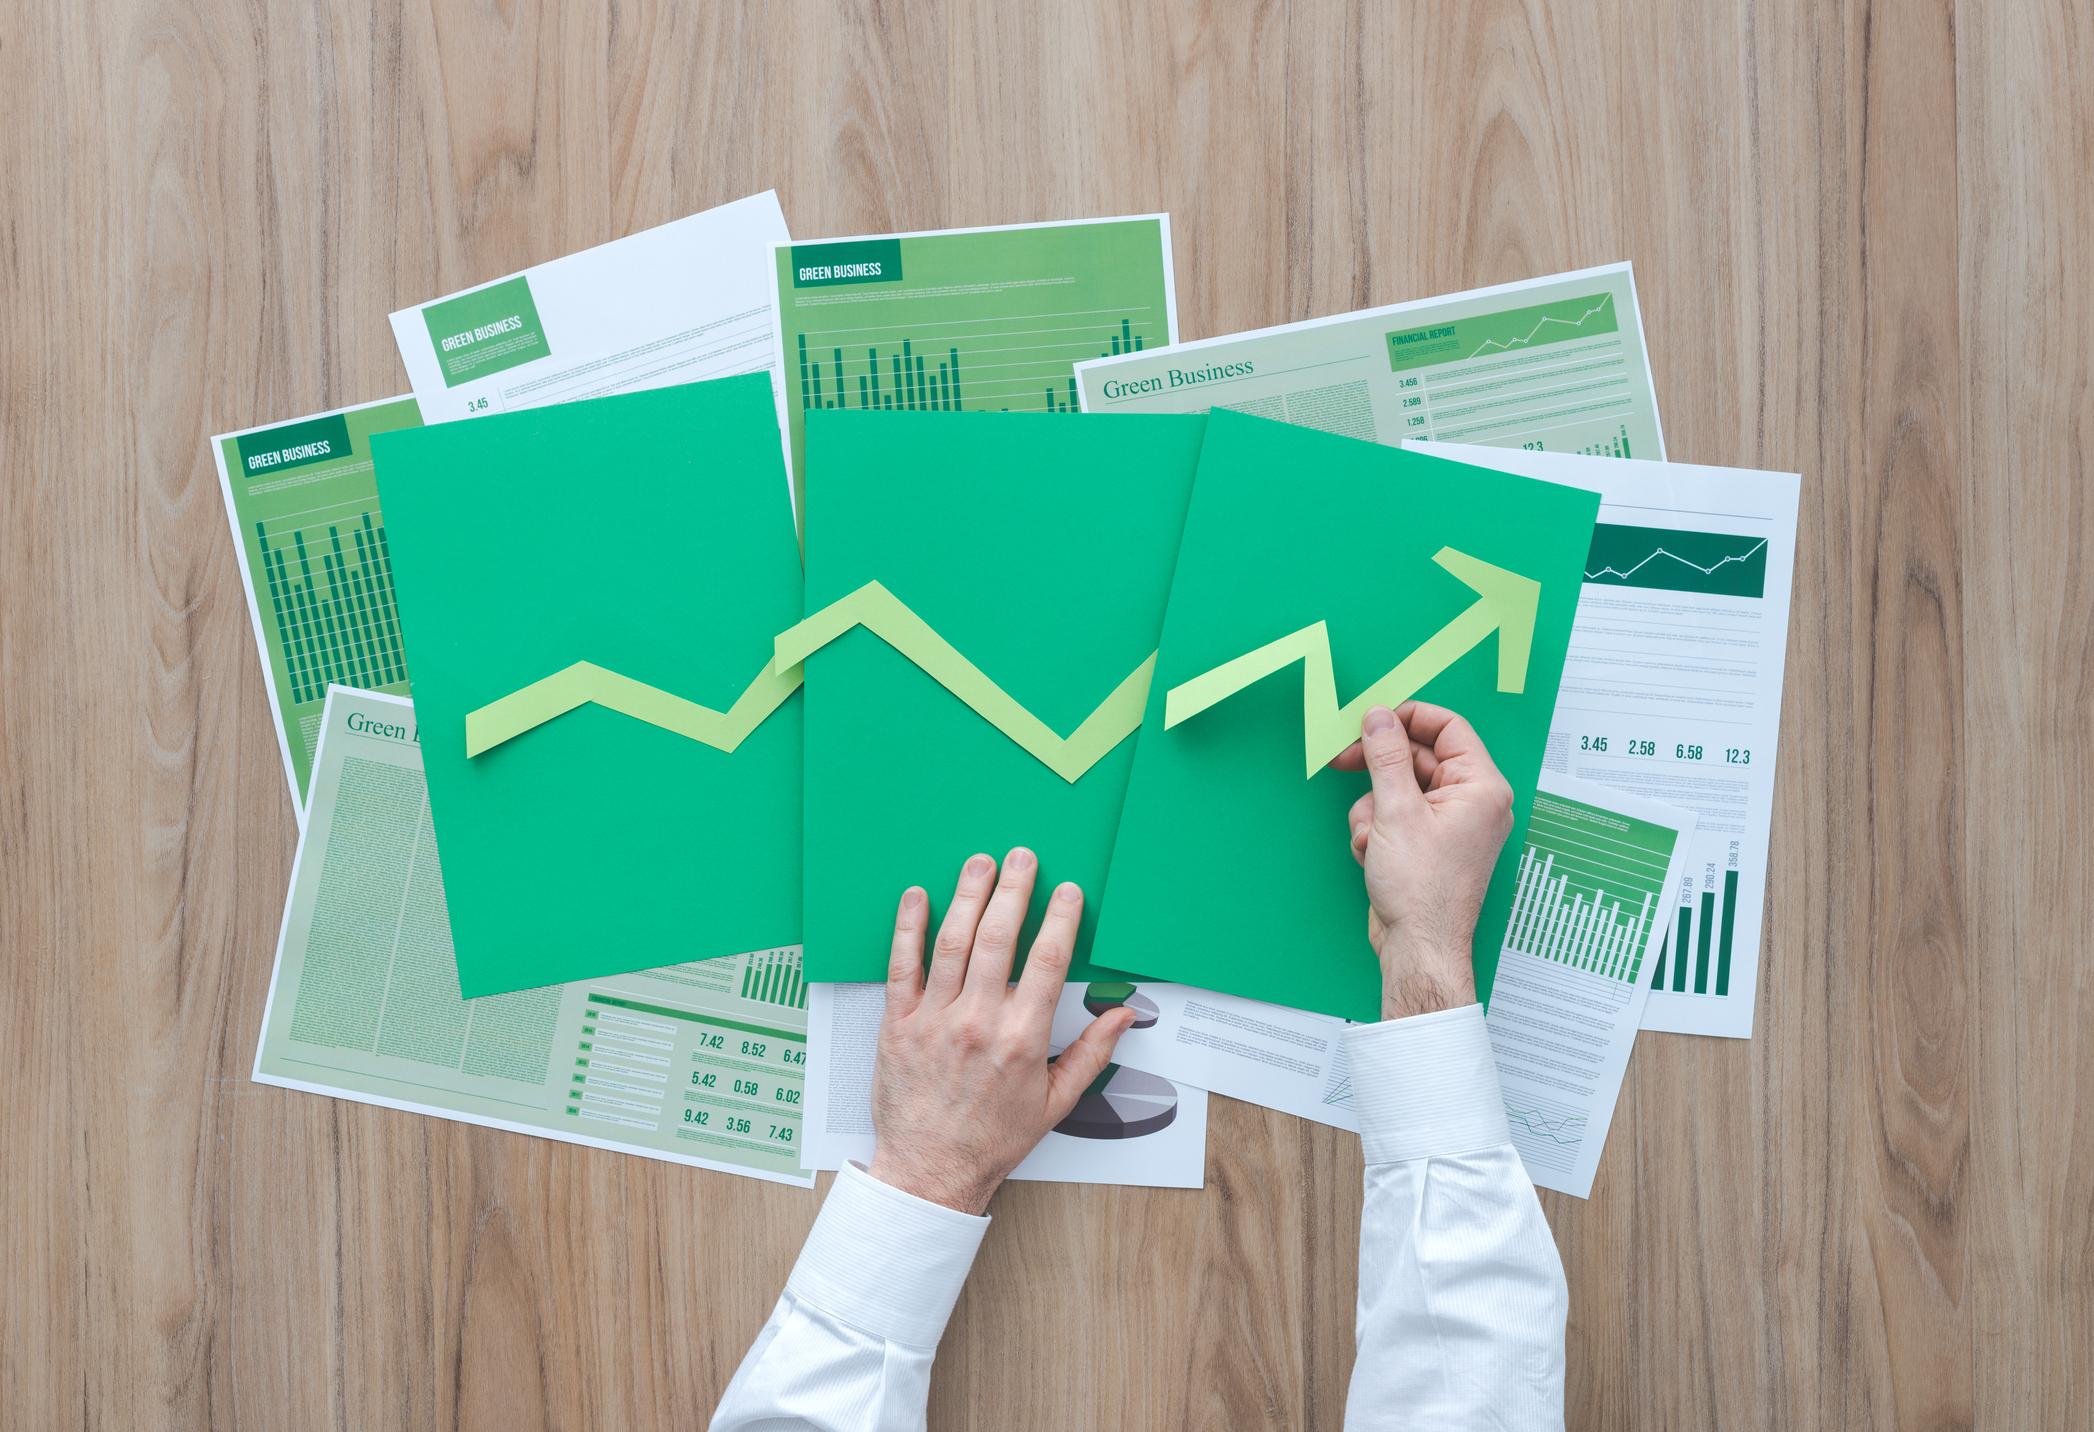 A person's hands arrange cut out construction paper into an upward trending arrow.